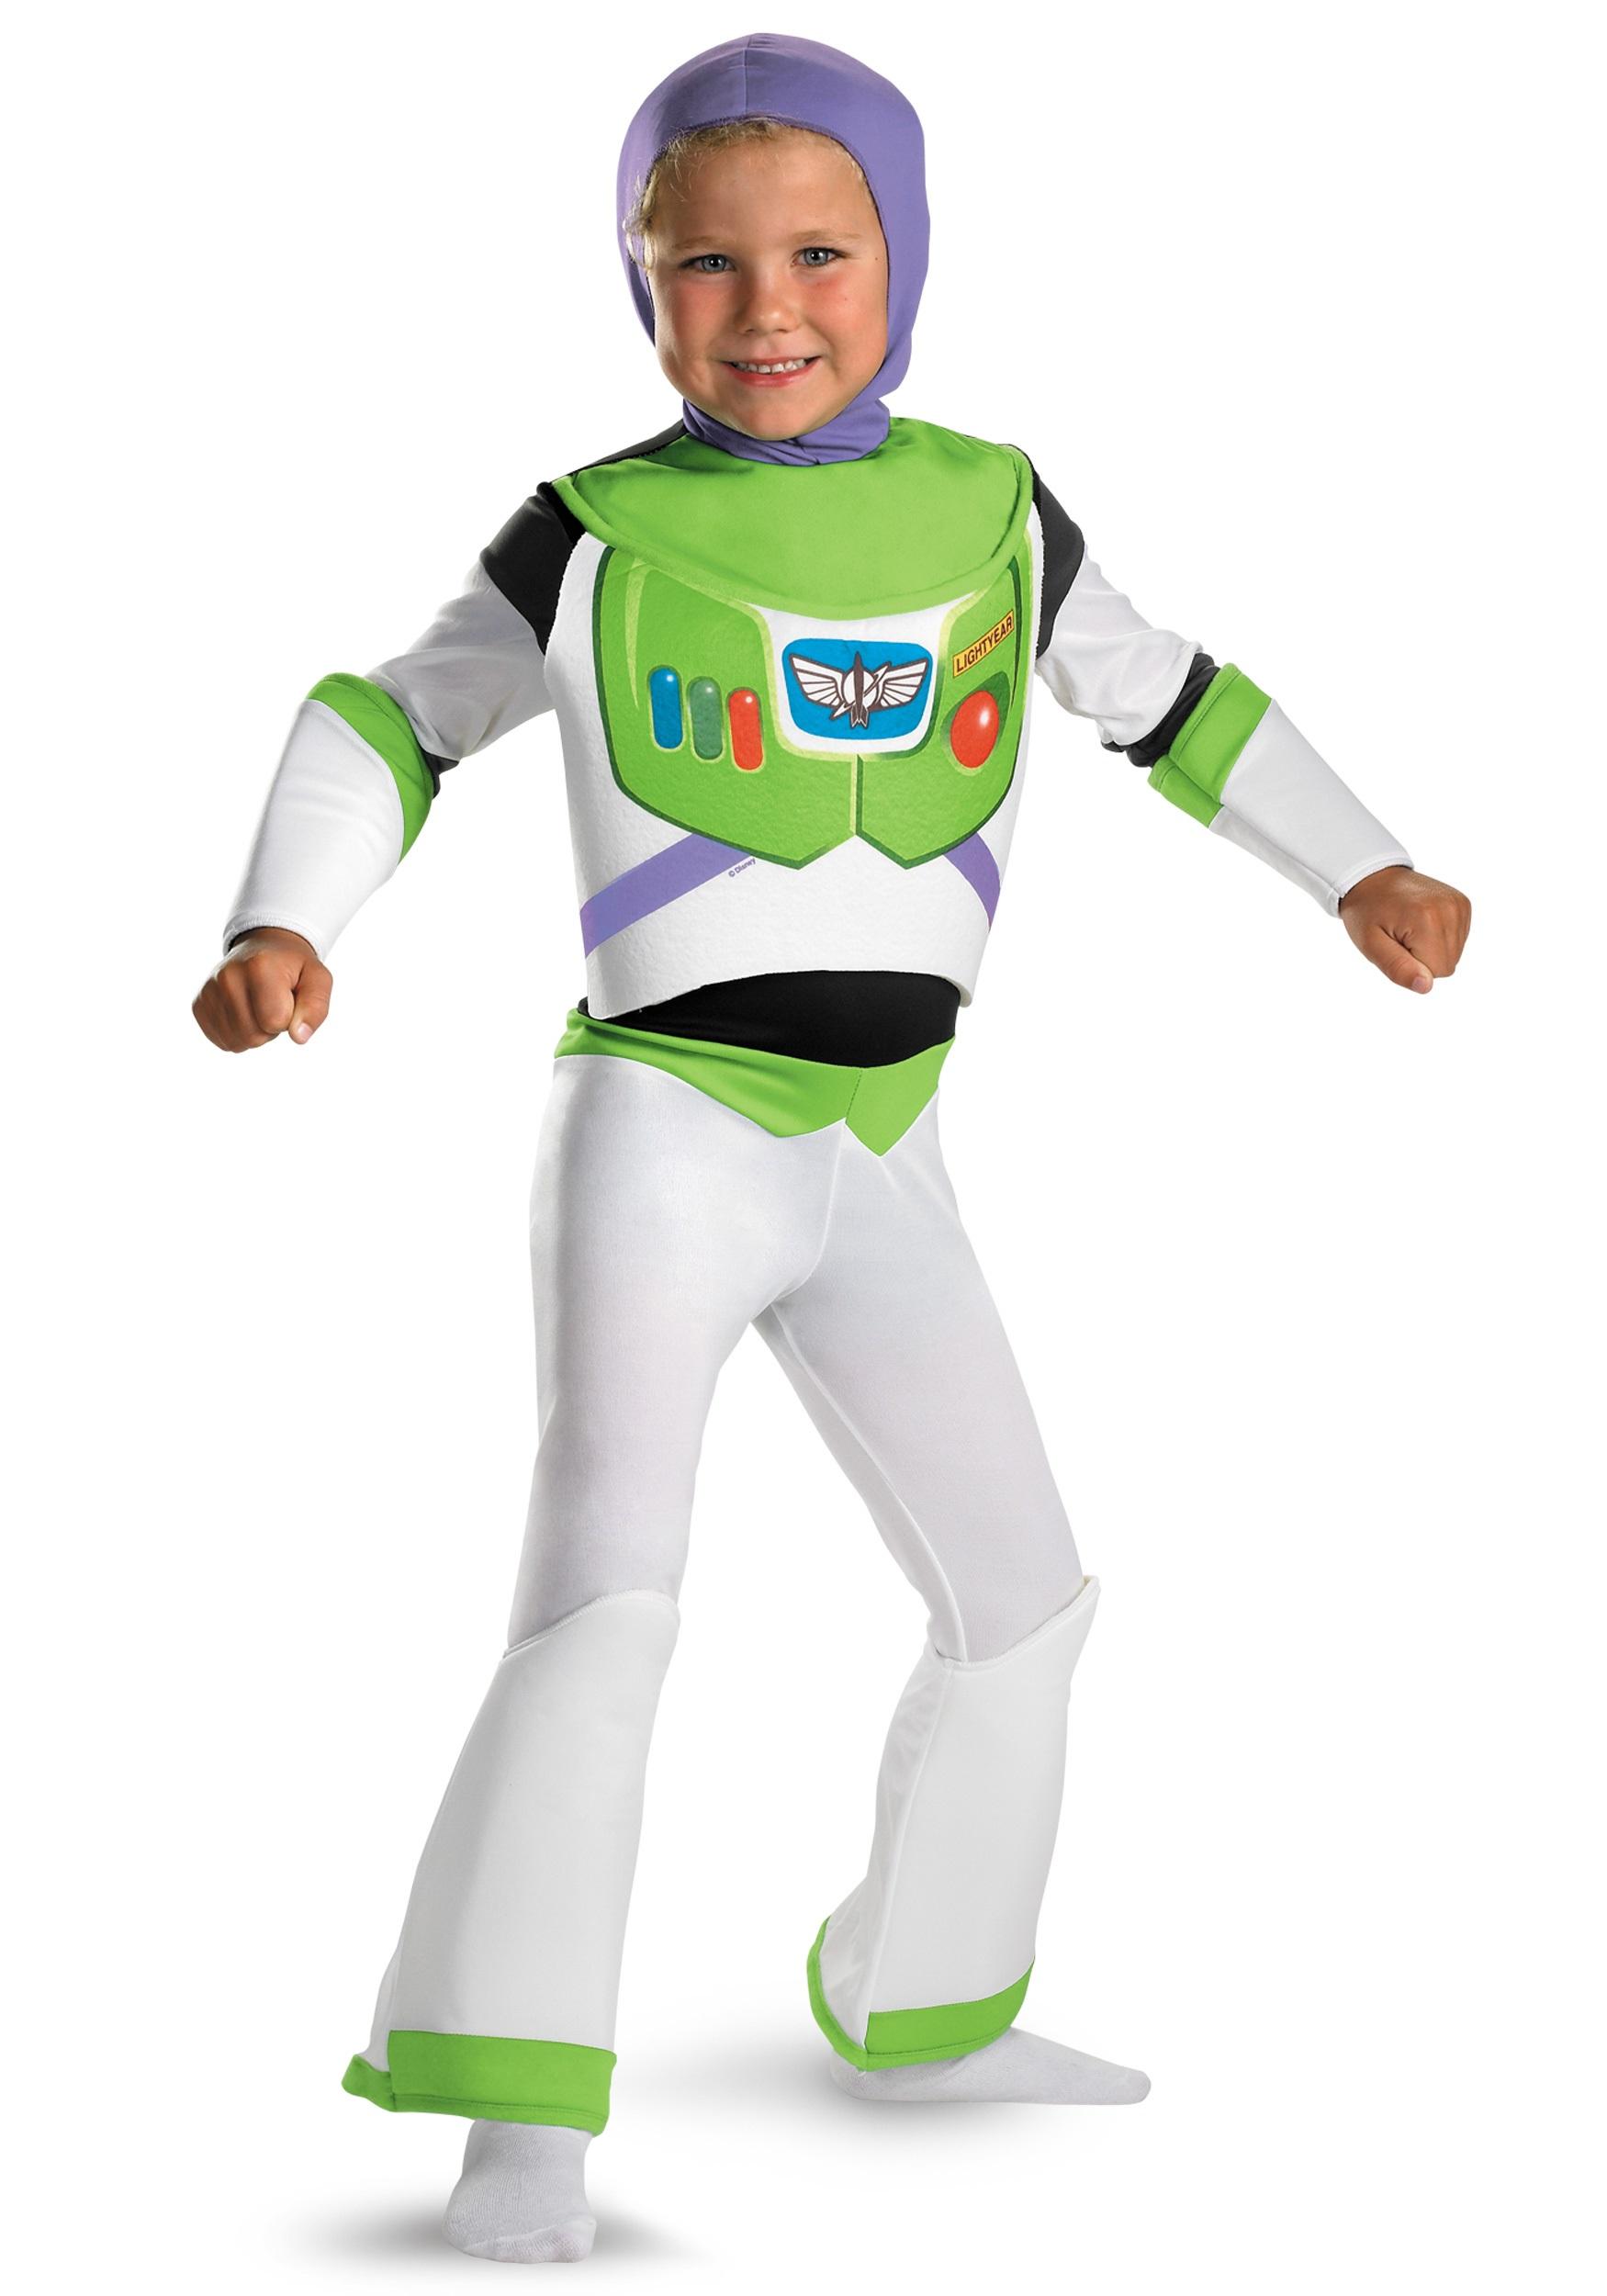 Toy Story Costumes - Adult, Kids Disney Halloween Costume